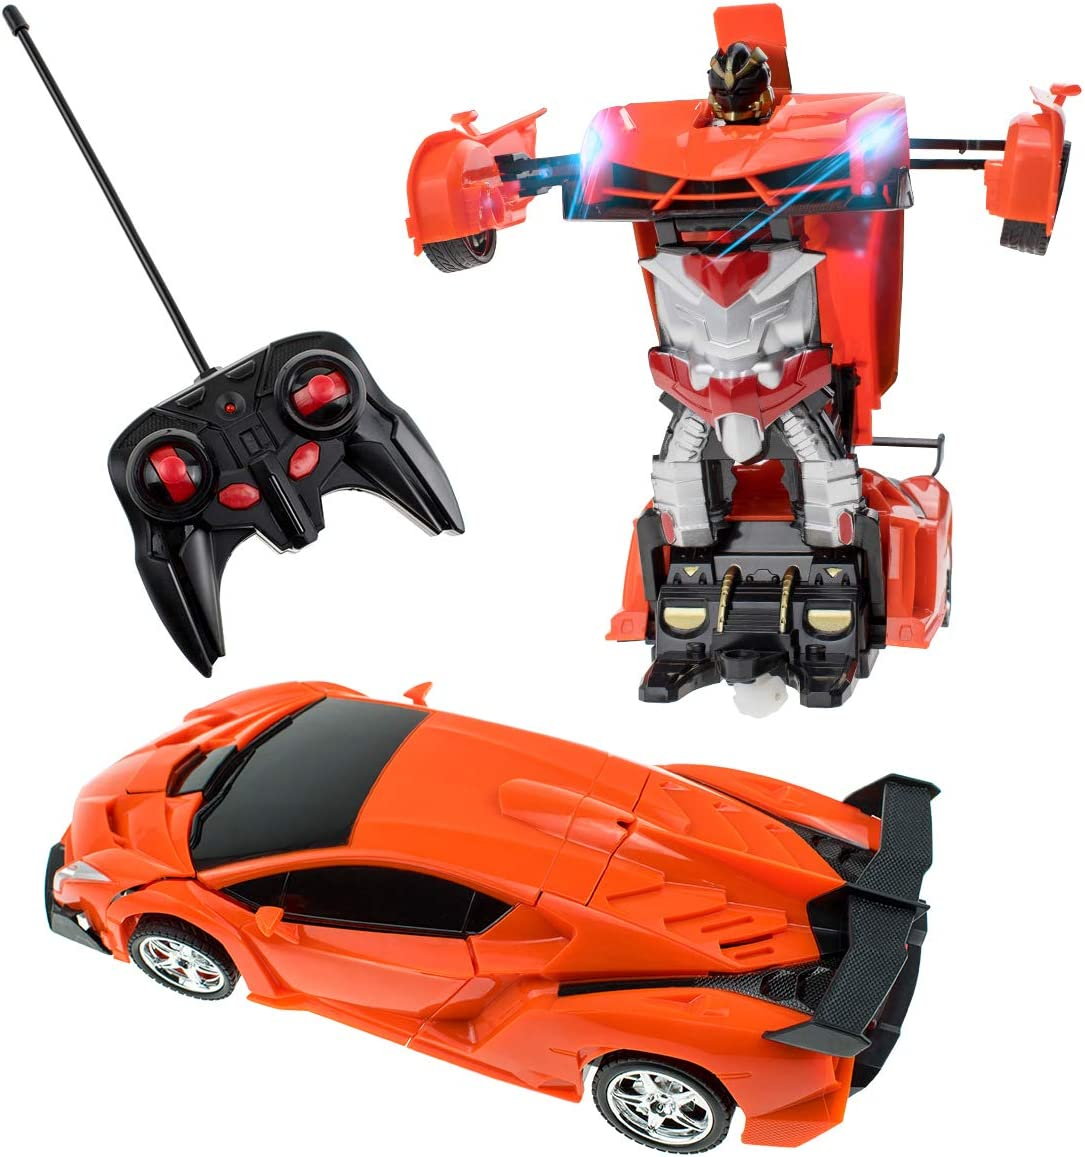 Children Transforming Robot Vehicles Car Plane Flexible Educational Toy Gifts